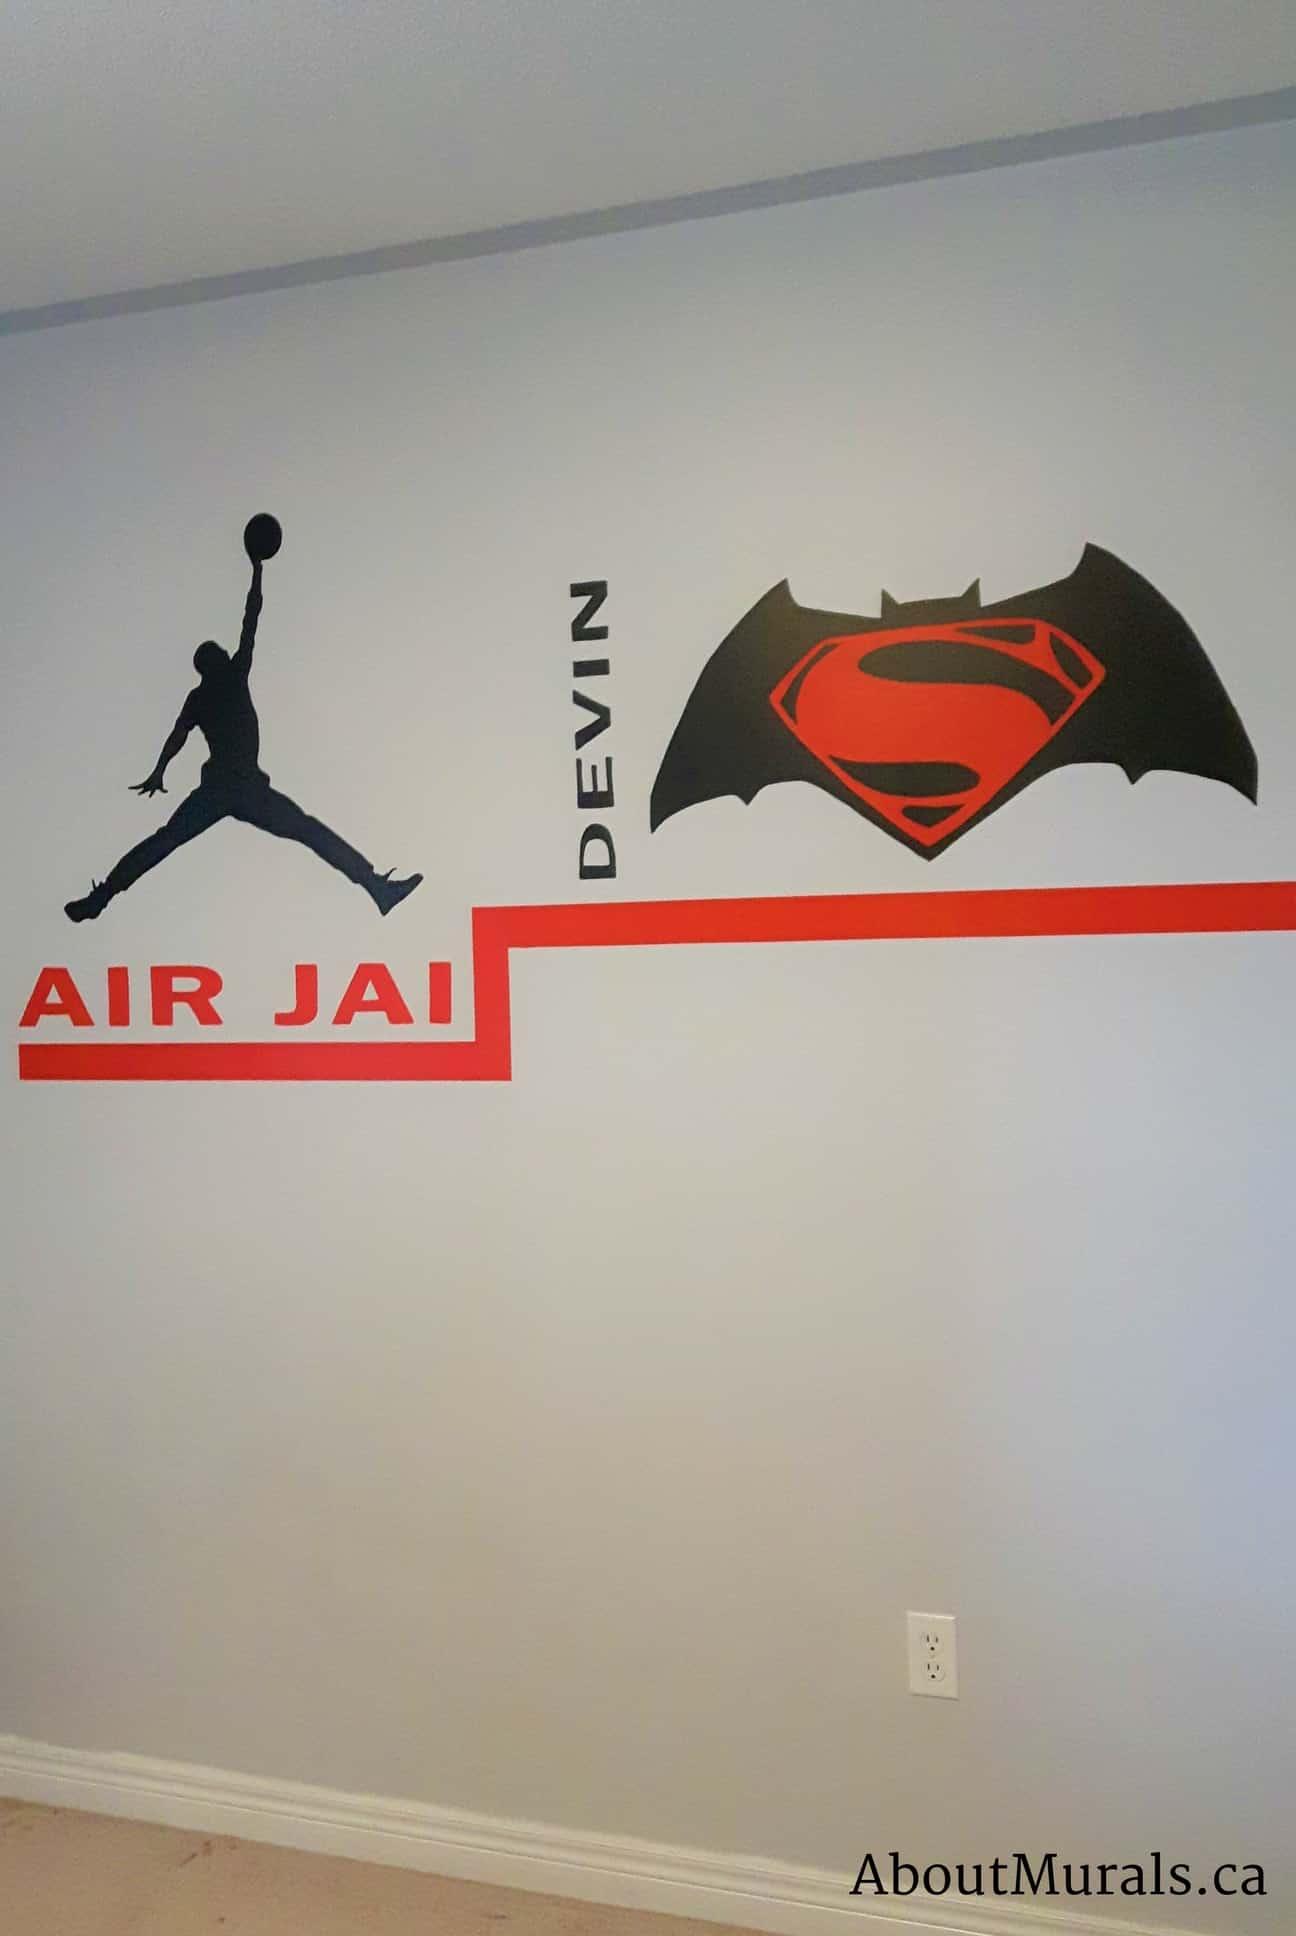 A kids wall mural featuring a personalized Air Jordan logo and Batman versus Superman logo